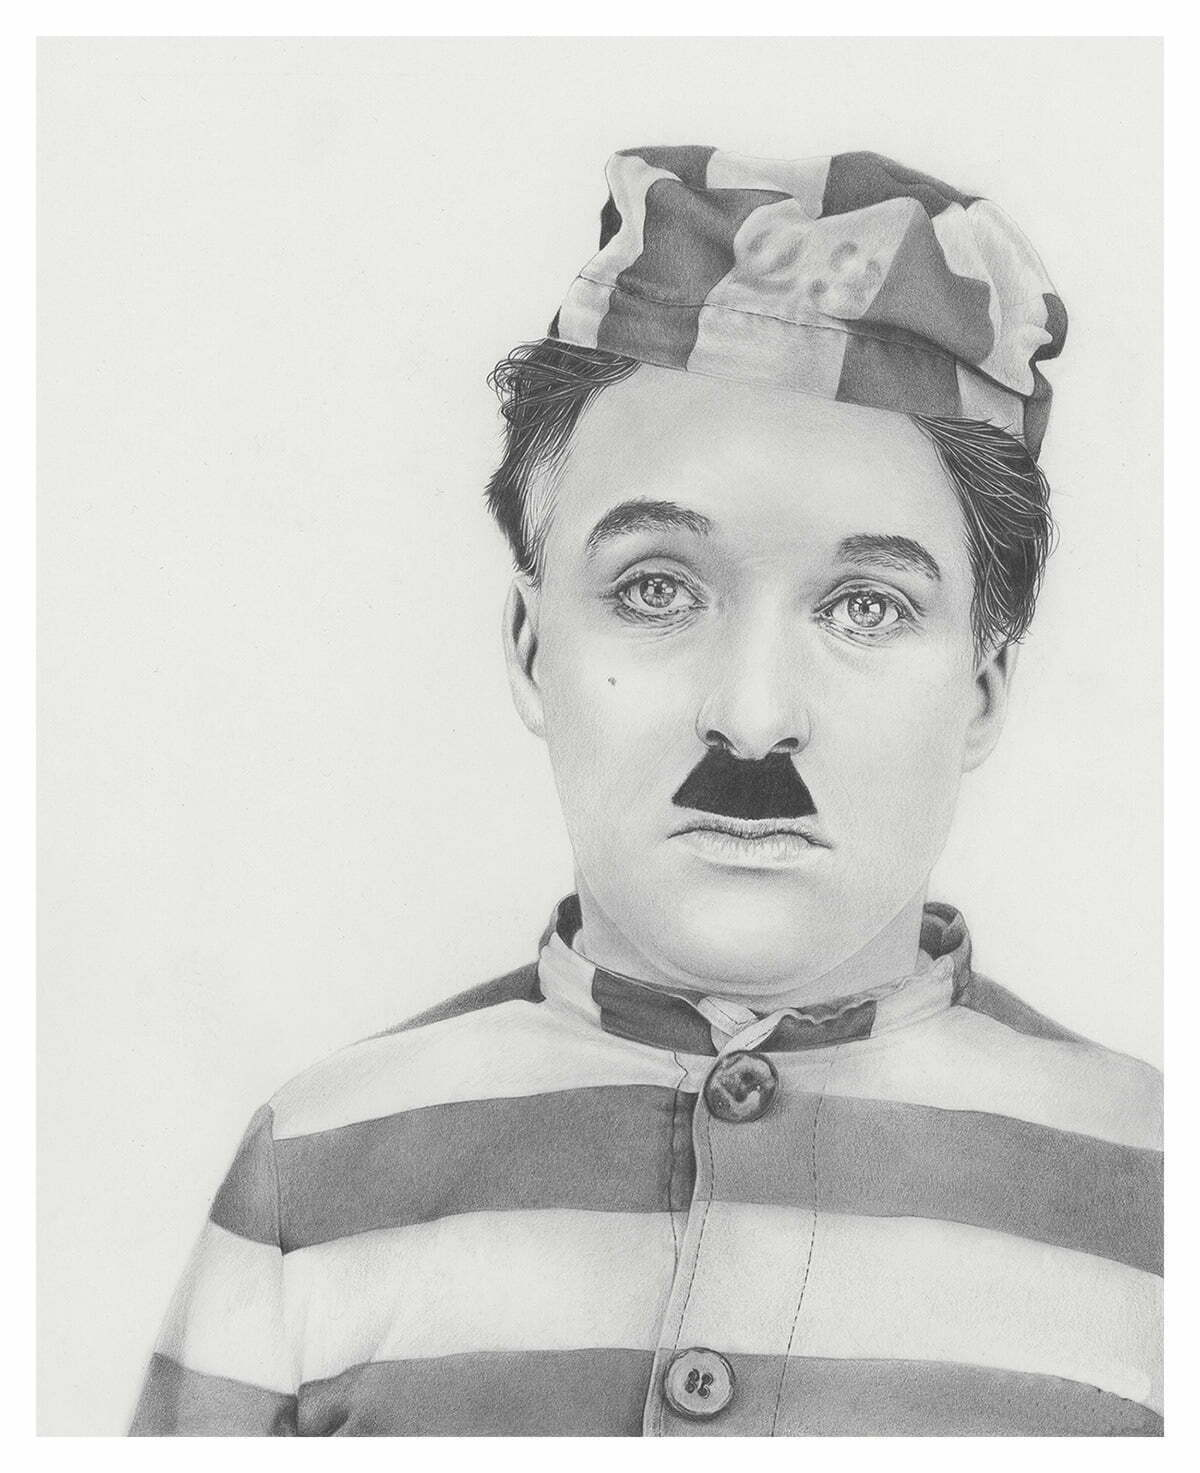 2D Charlie Chaplin Realistic Pencil Character Illustration